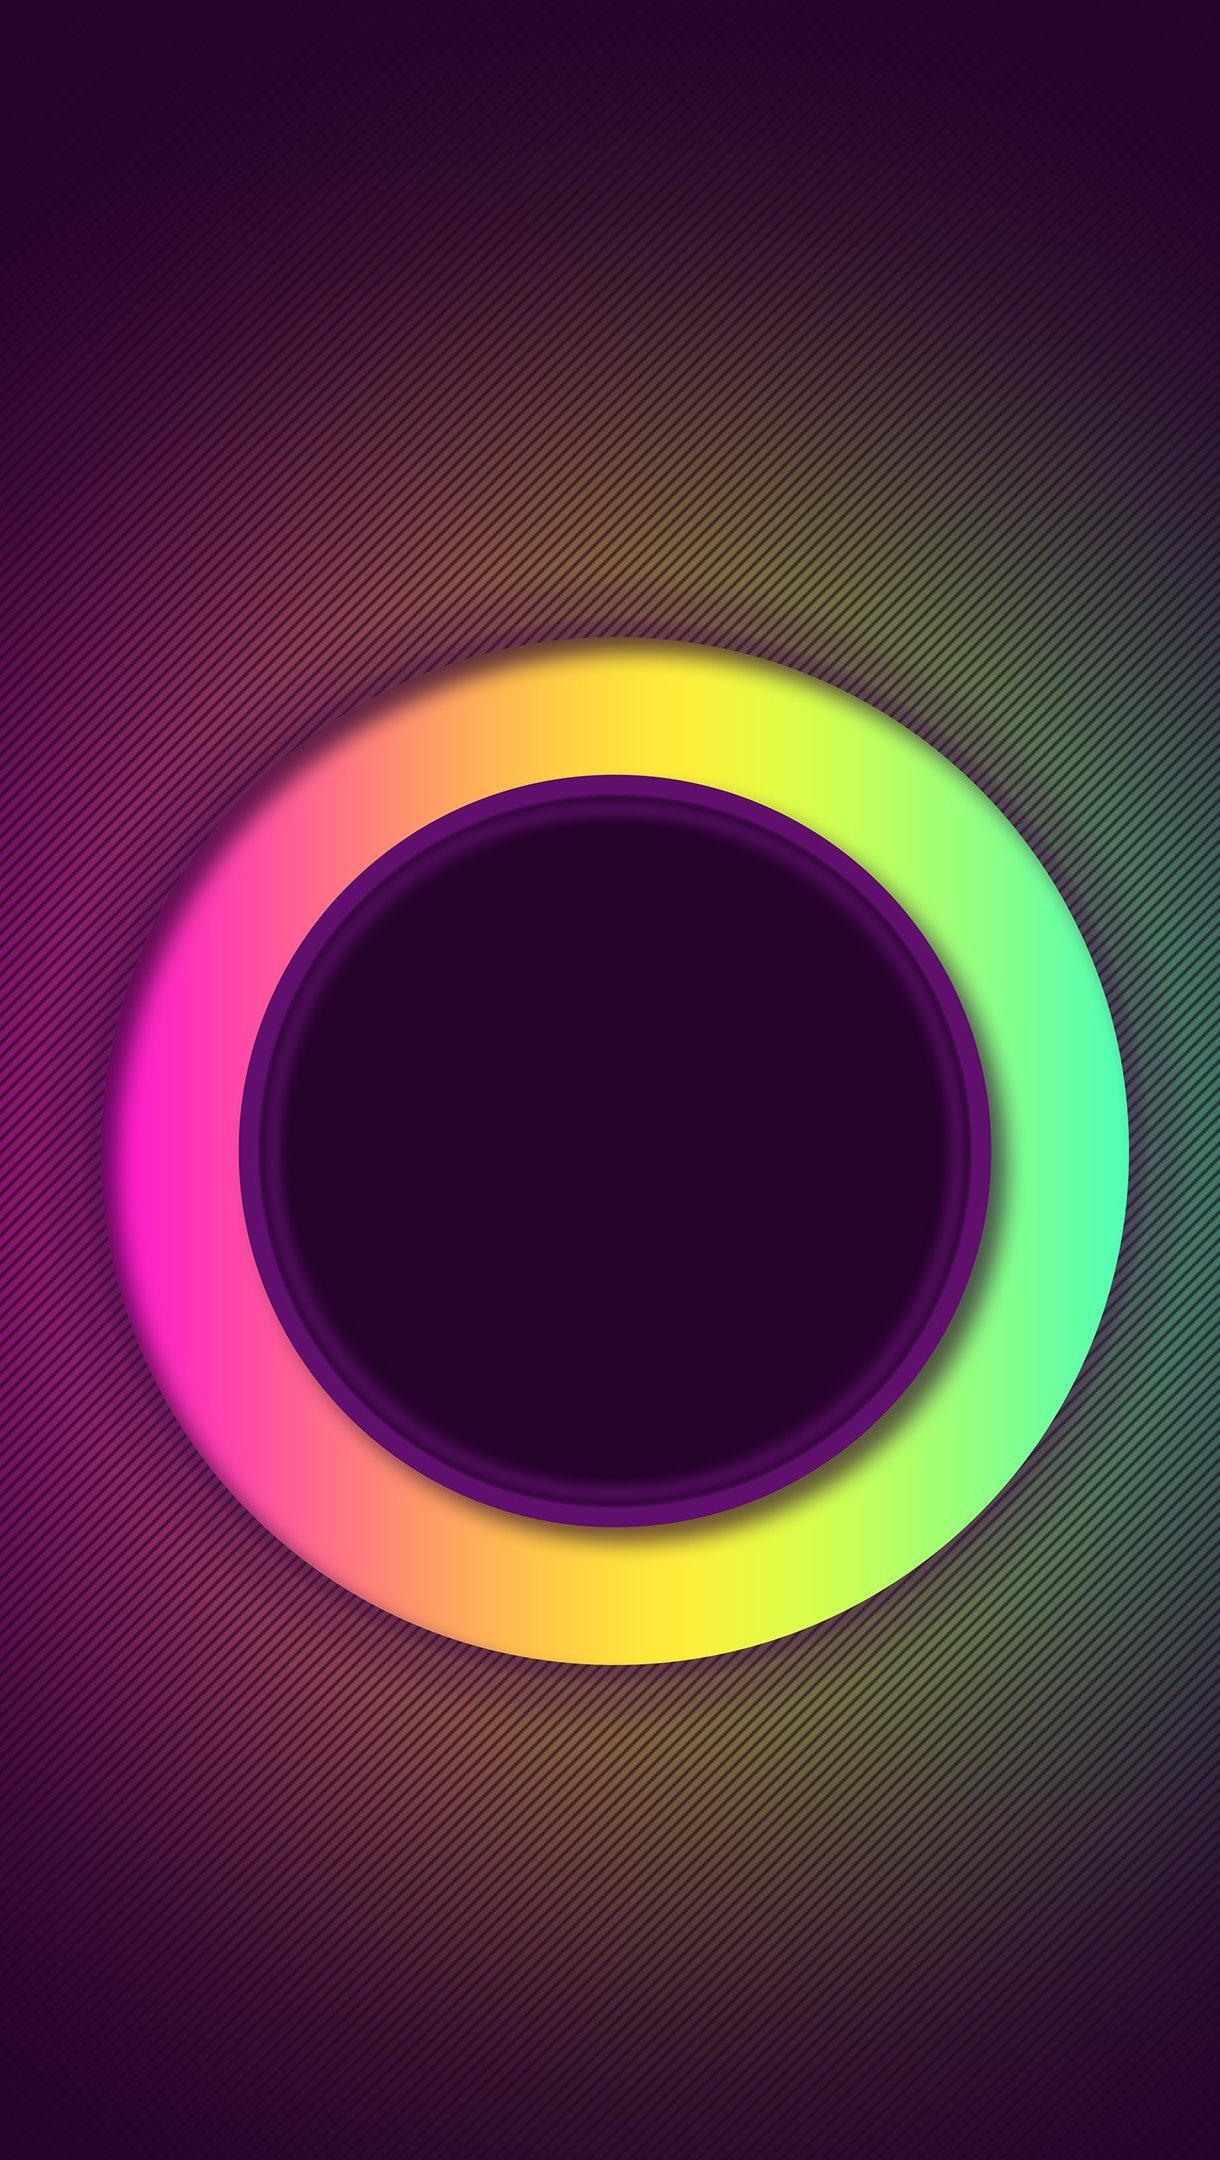 Wallpaper Ring of colors Vertical